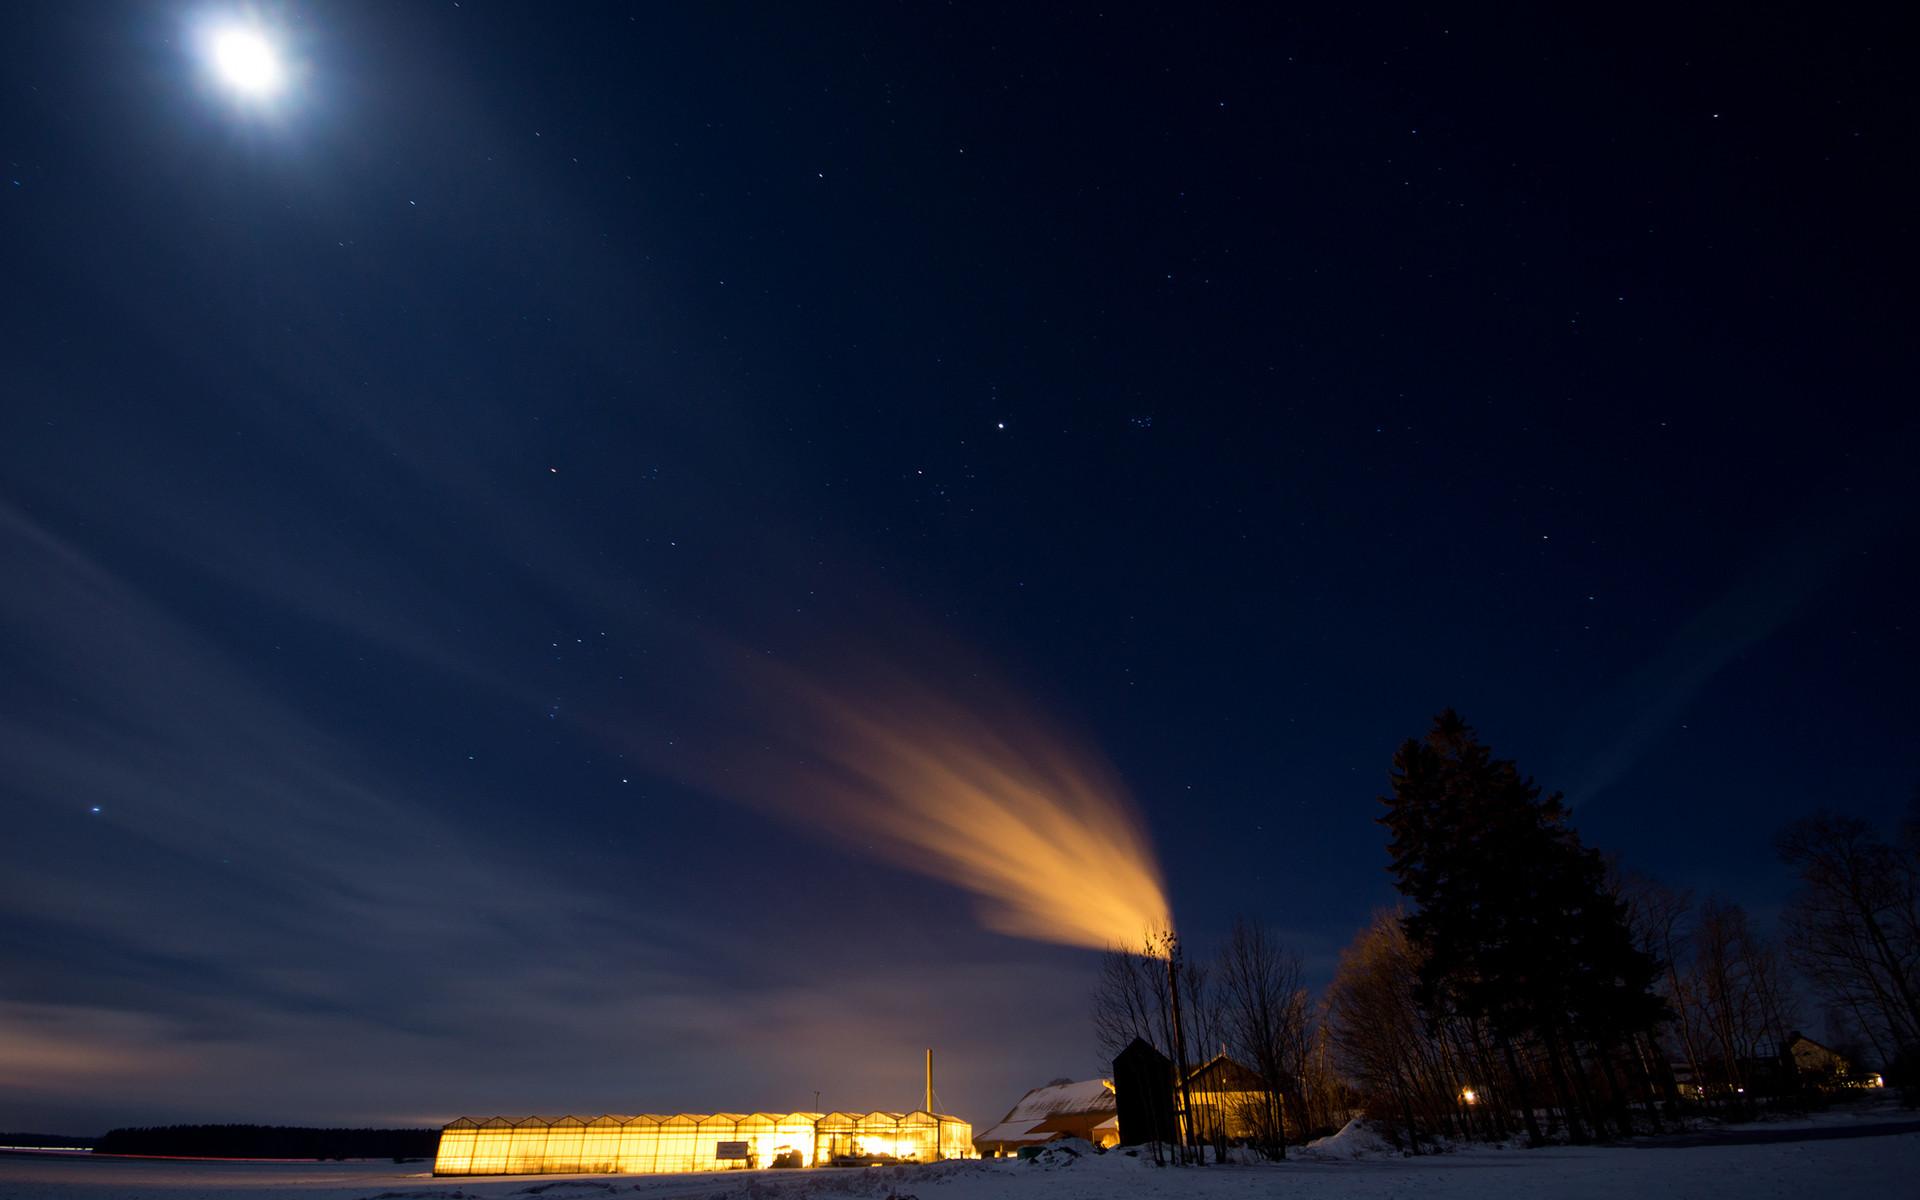 Download Free Winter Night In Moonlight Wallpaper.